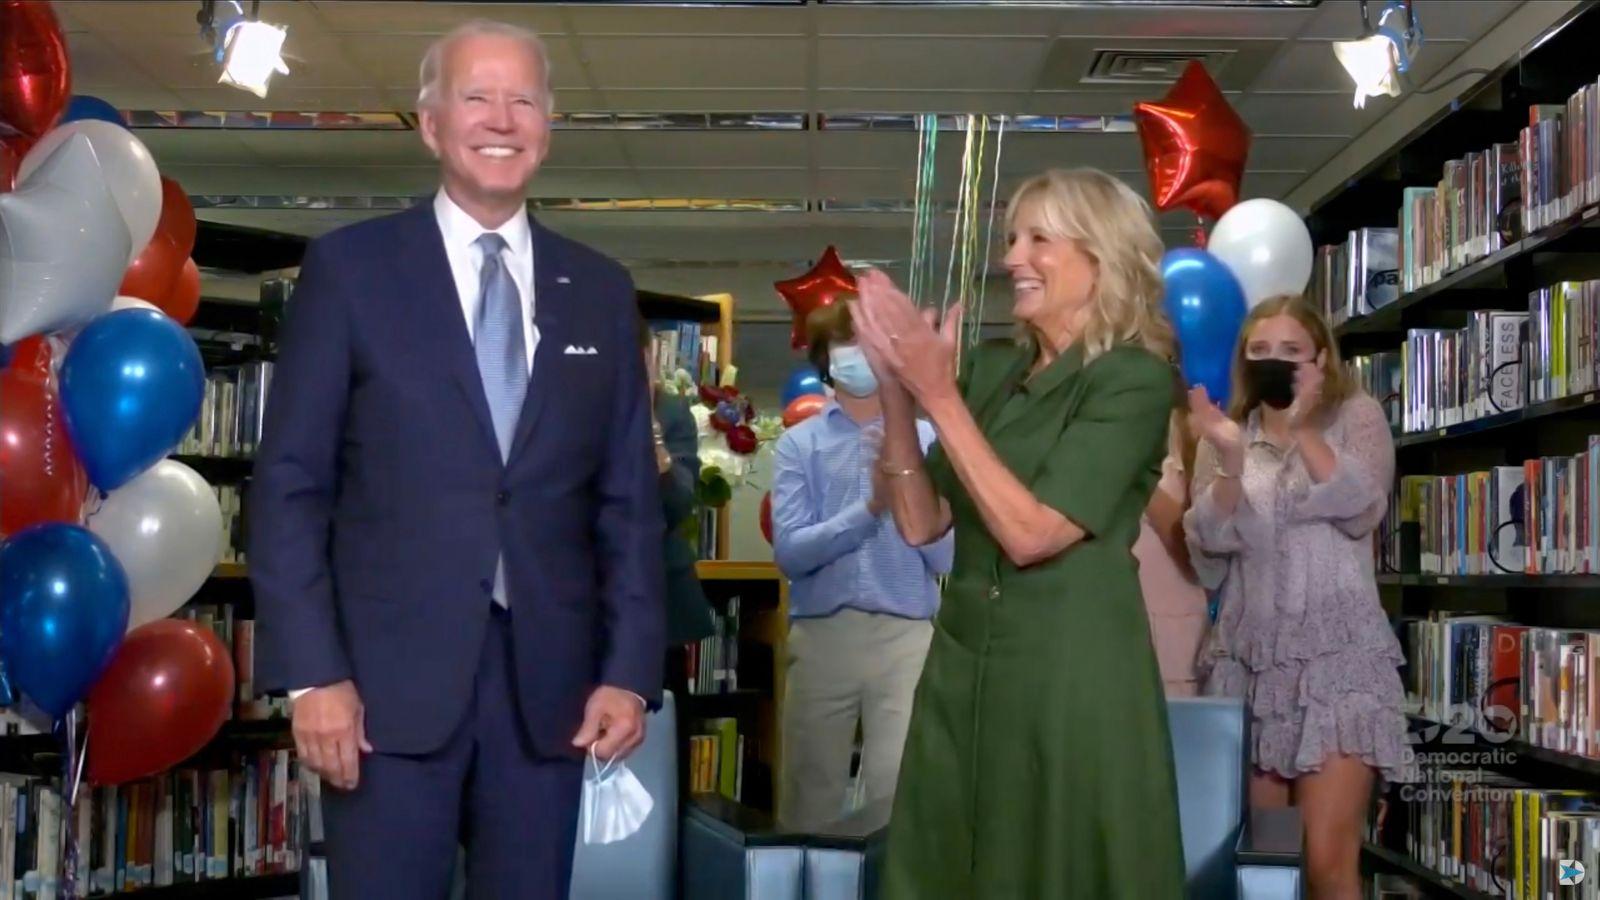 US election 2020: Joe Biden formally nominated as Bill Clinton lays into Trump | US News